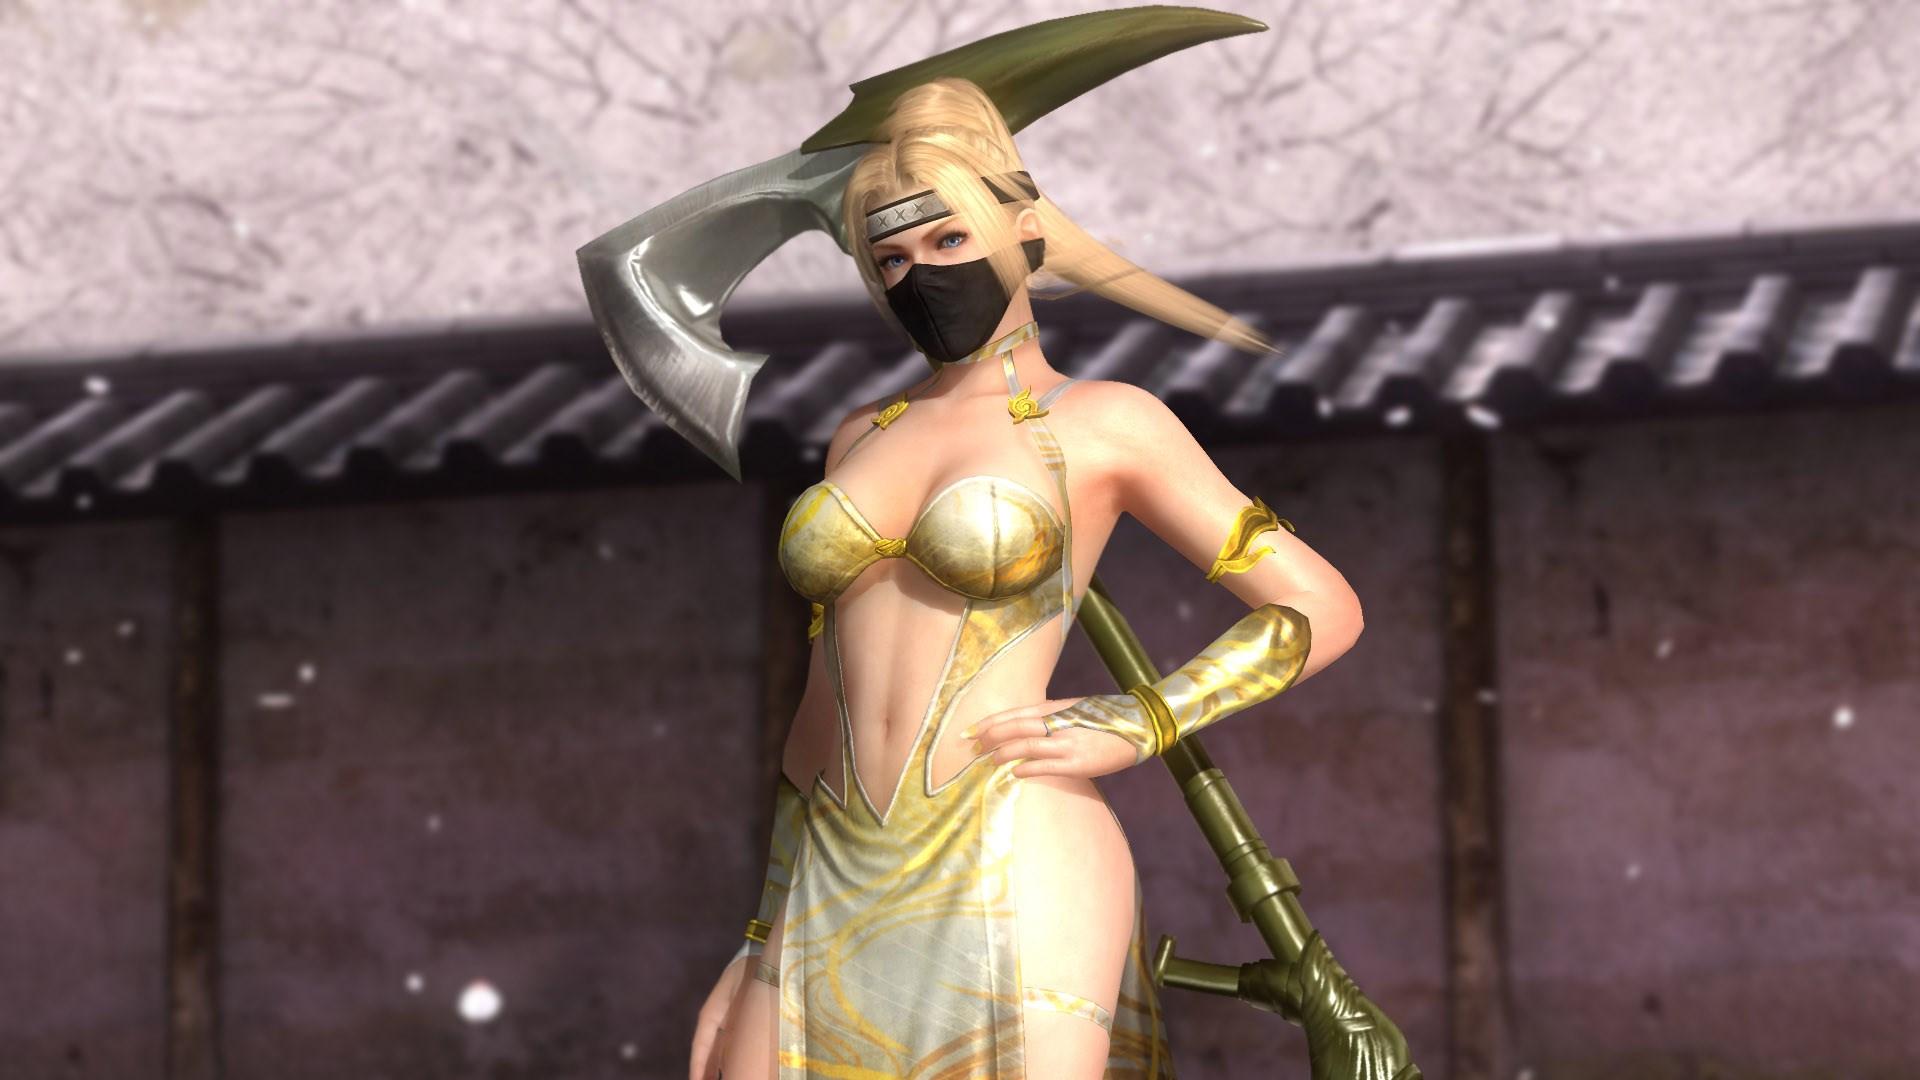 DOA5LR: Clã Ninja 3 - Rachel